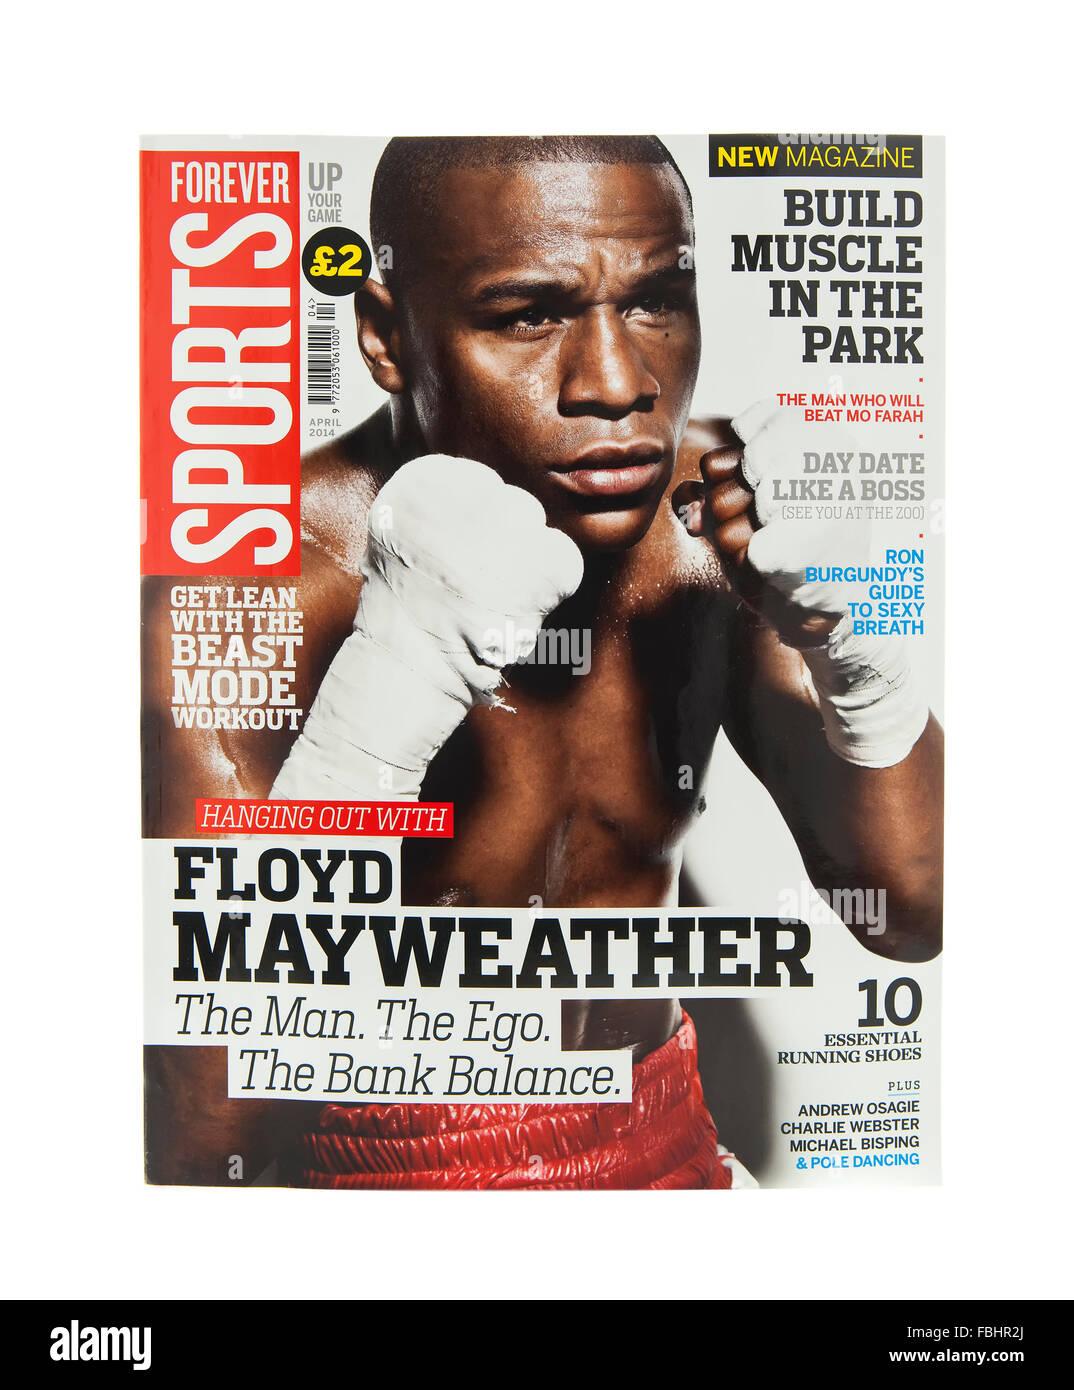 Forever Sports Magazine on a white background - Stock Image